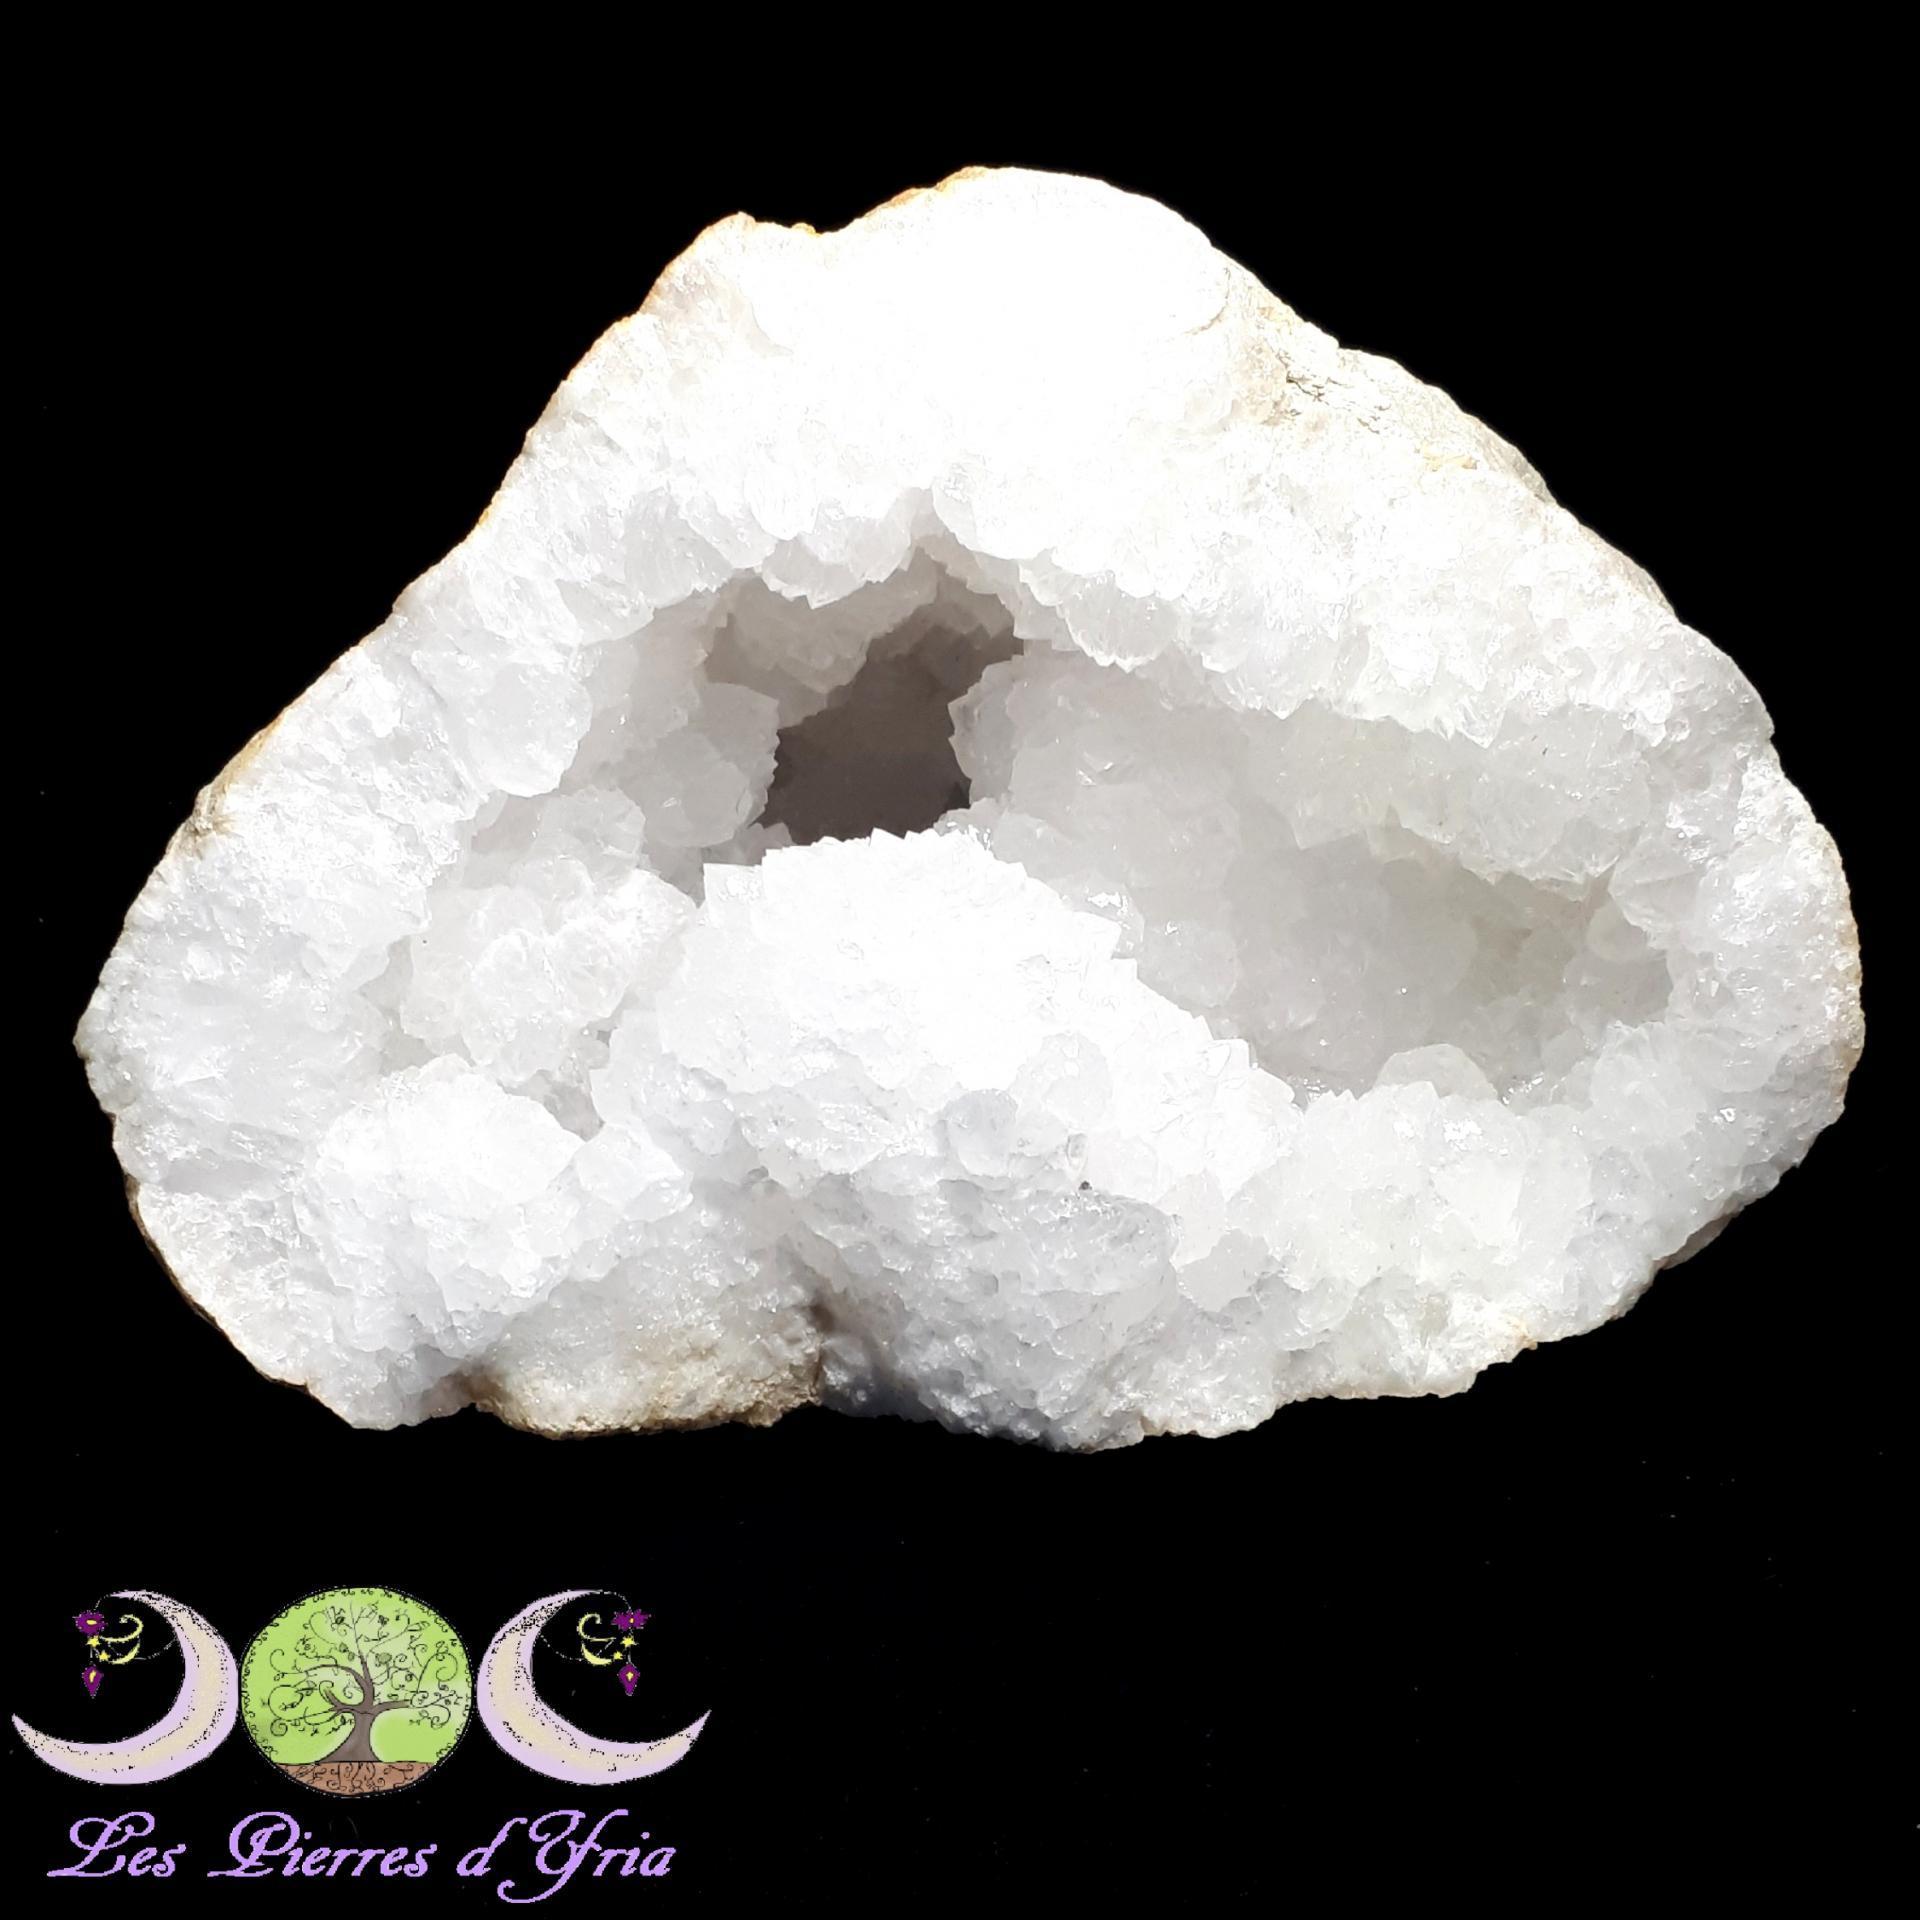 Geode cdr 28 gf